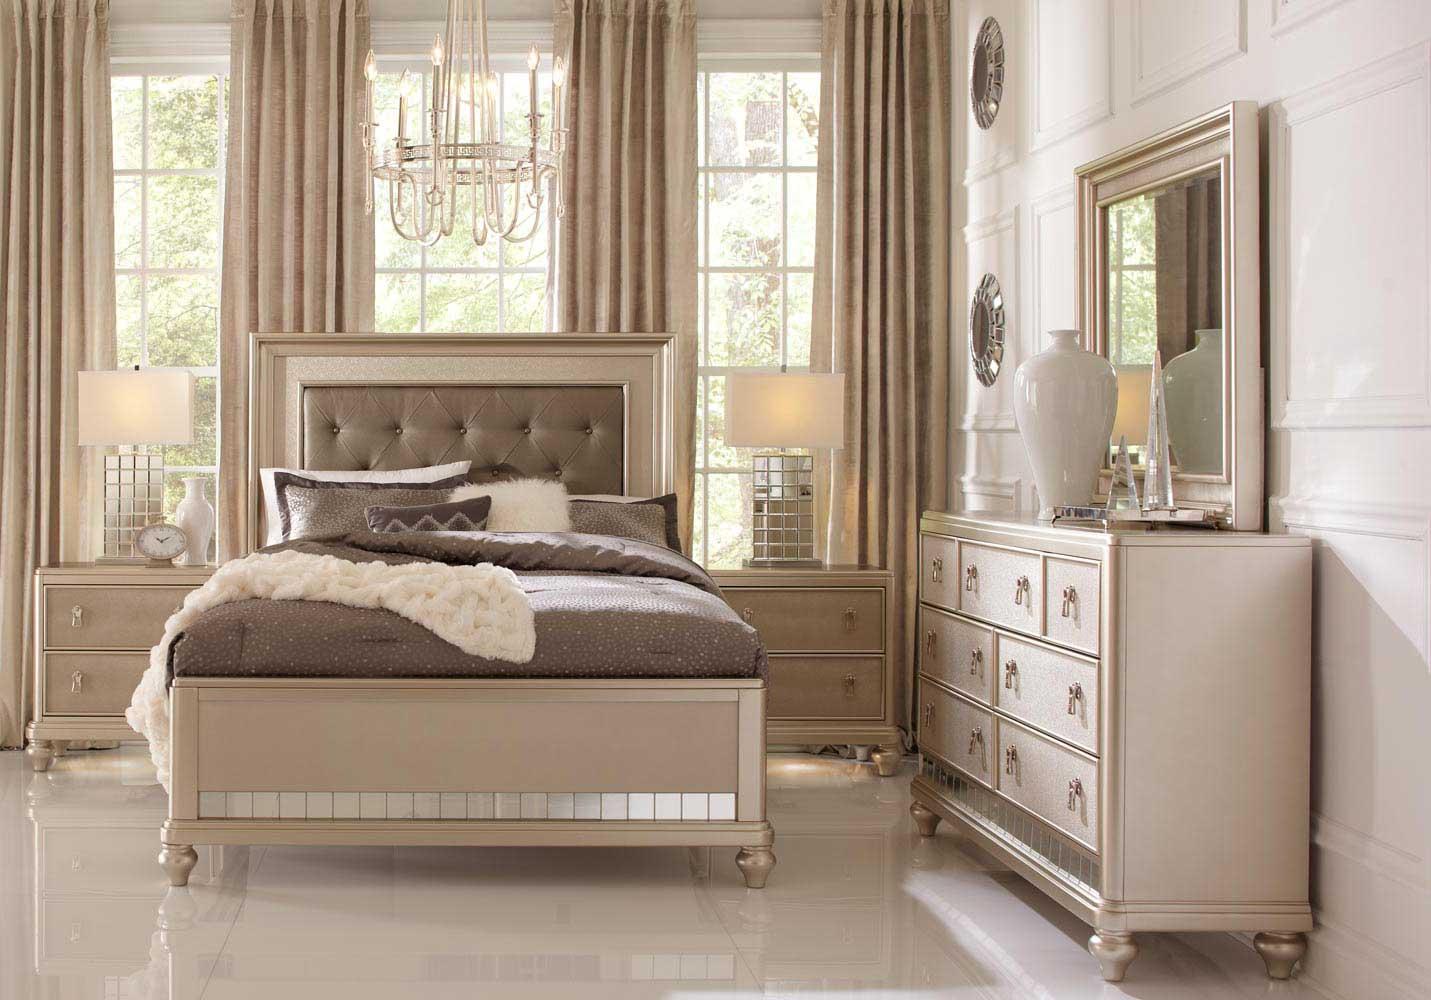 Bedroom SetsQueen Bedroom Collection Personalised Home Design. Mayville 5 Pc Queen Bedroom Set. Home Design Ideas